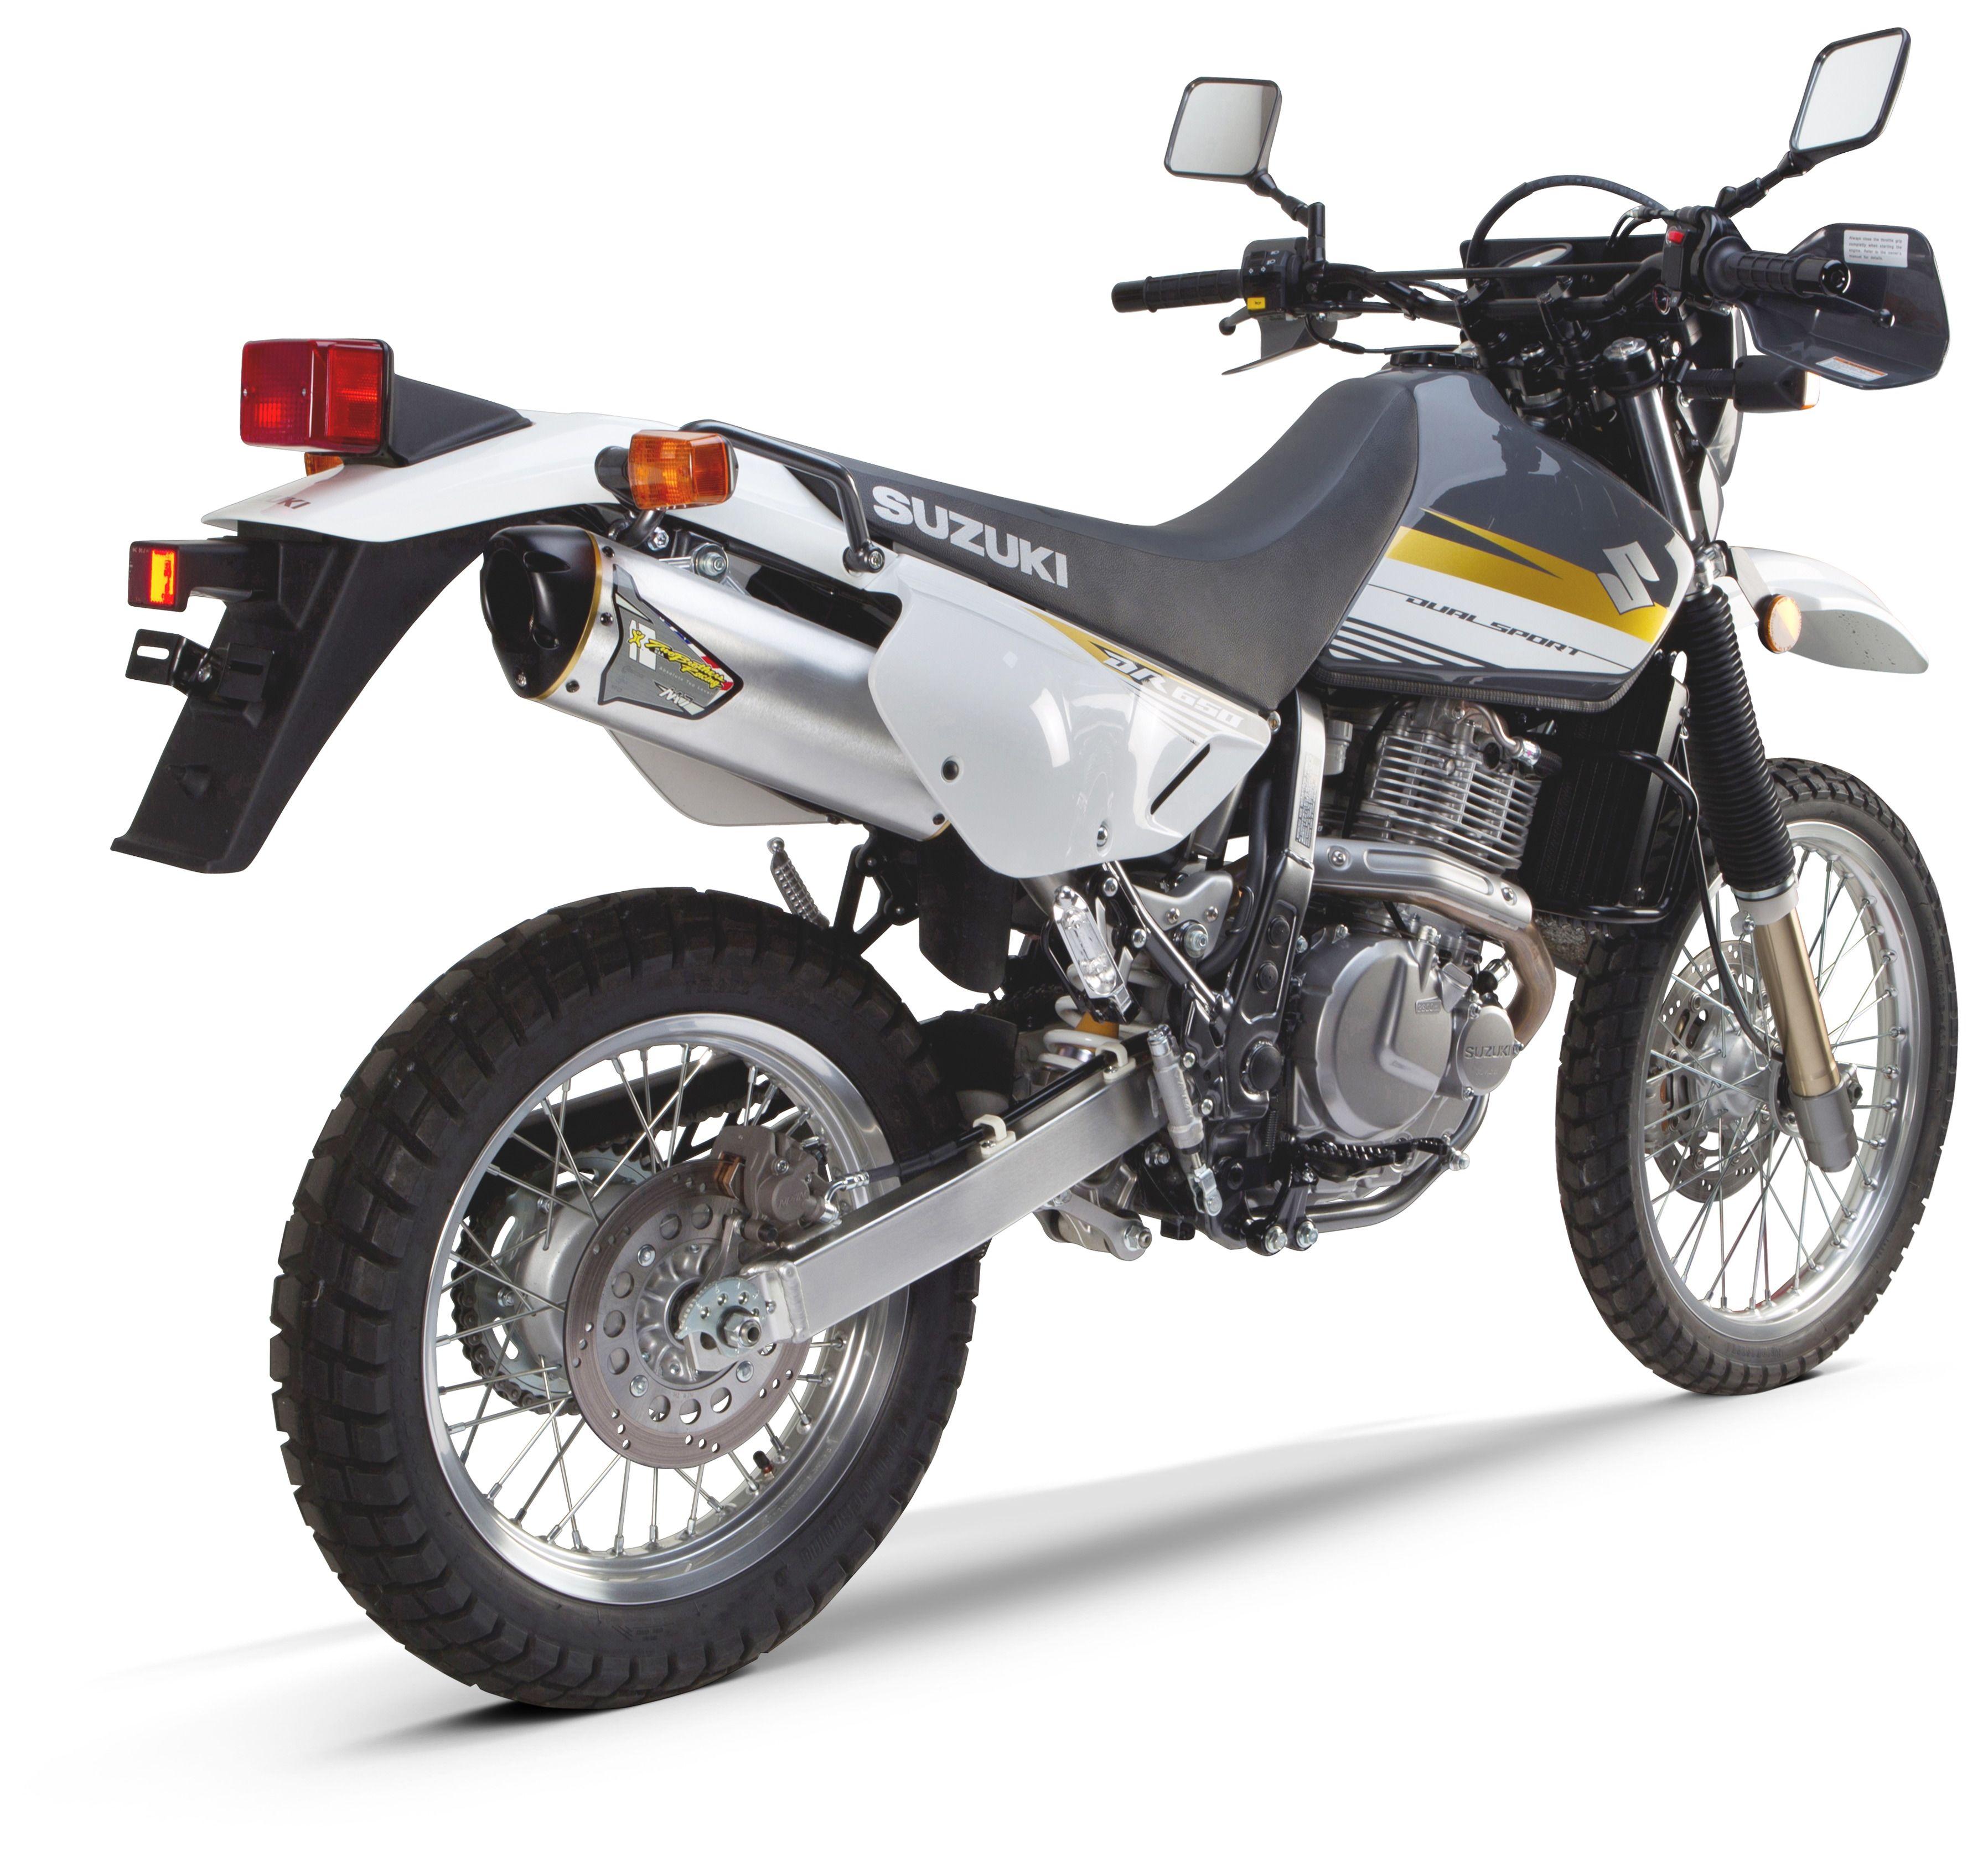 Two Brothers M7 Slip-On Exhaust Suzuki DR650 1998-2015